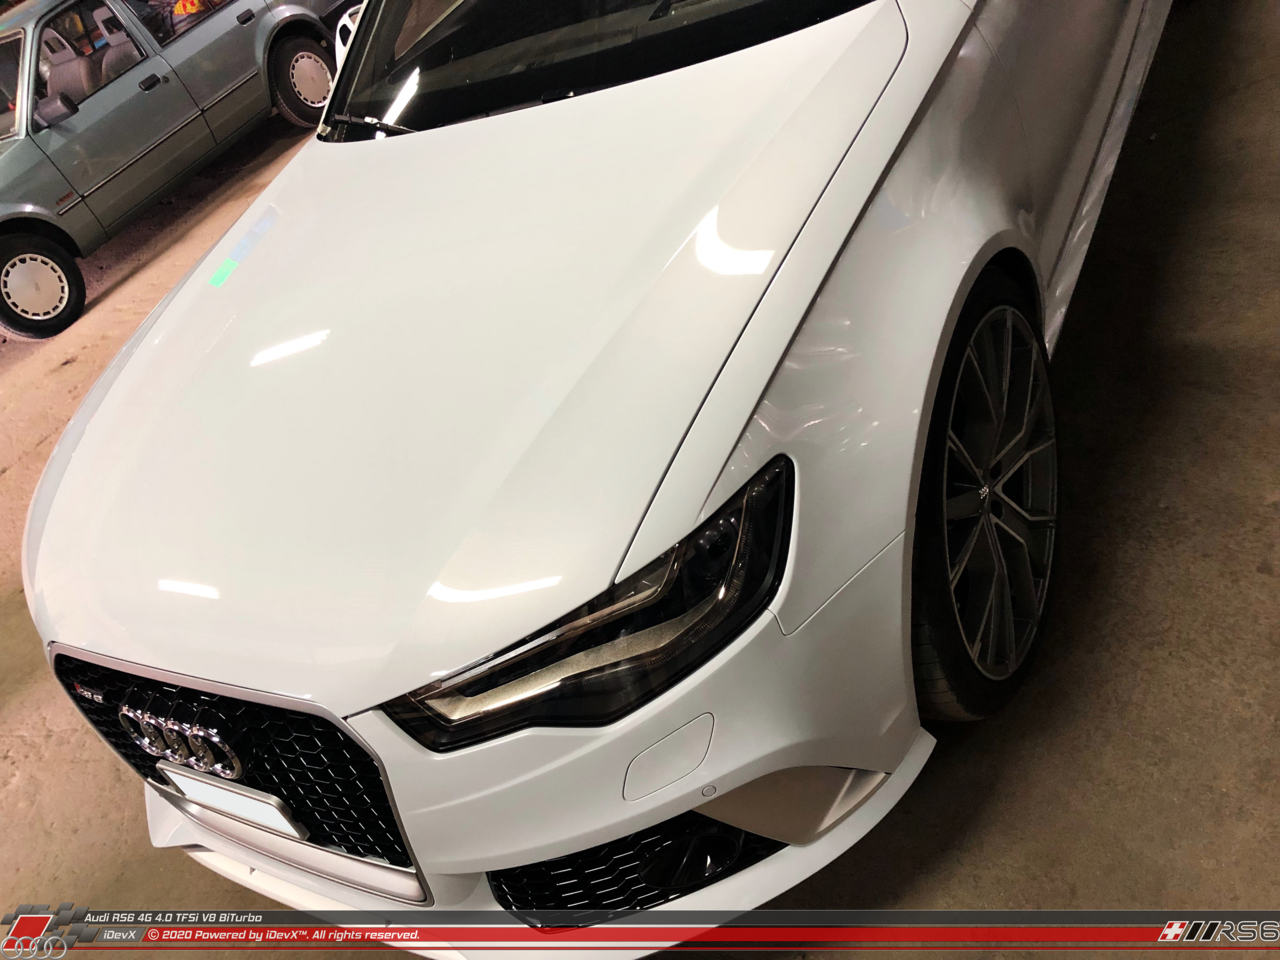 05_08.2019_Audi-RS6_iDevX_016.png